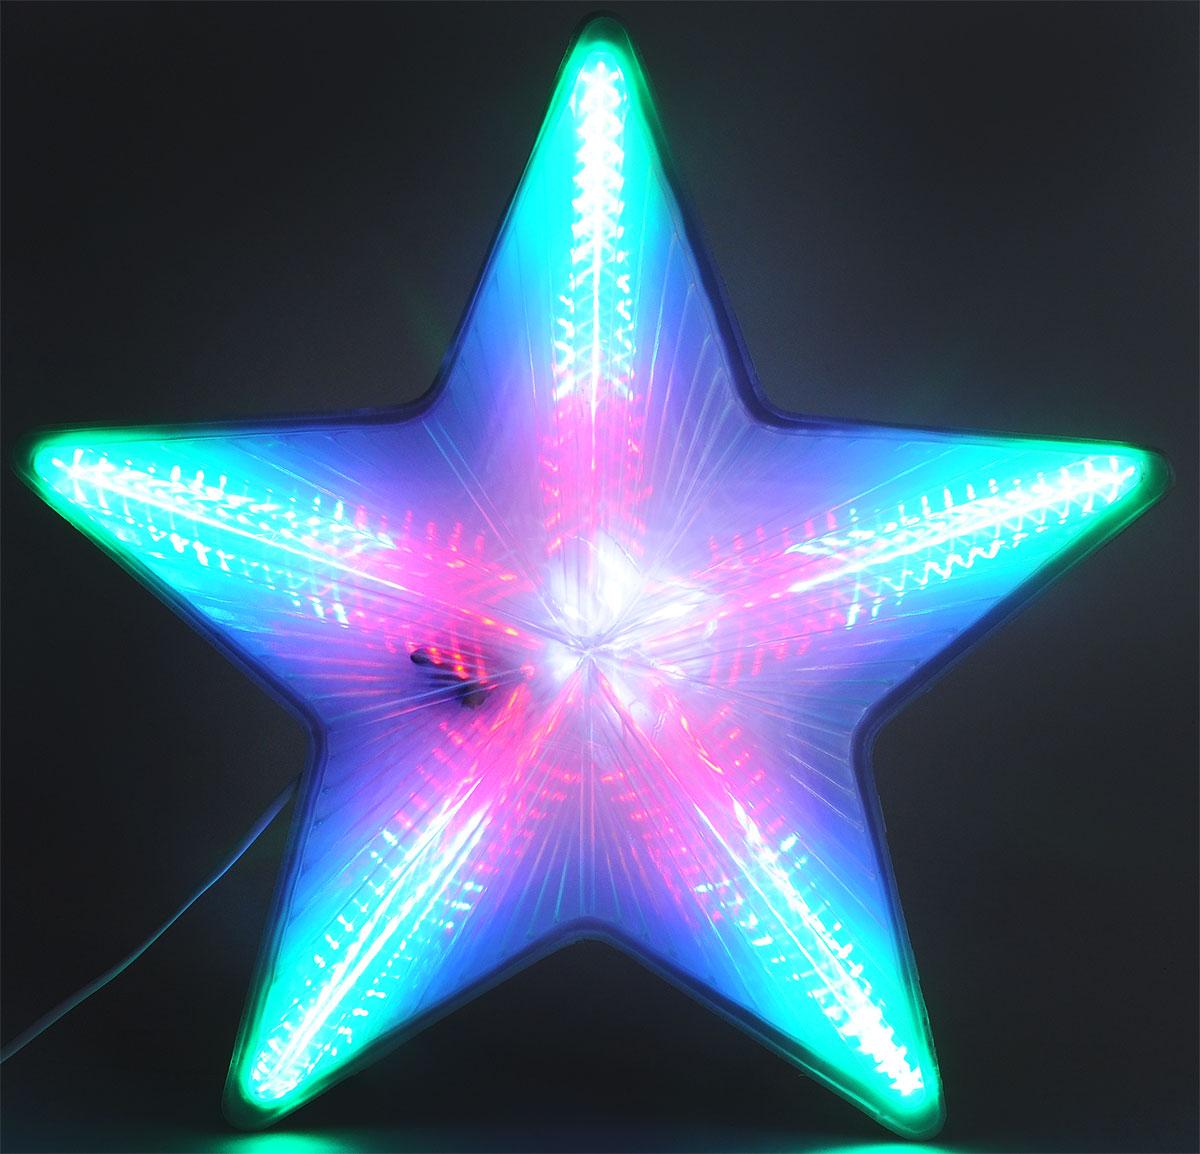 Фигура светодиодная B&H Звезда, 91 LED, цвет: белый, диаметр 49 см светодиодная фигура laitcom b247l d024a 40